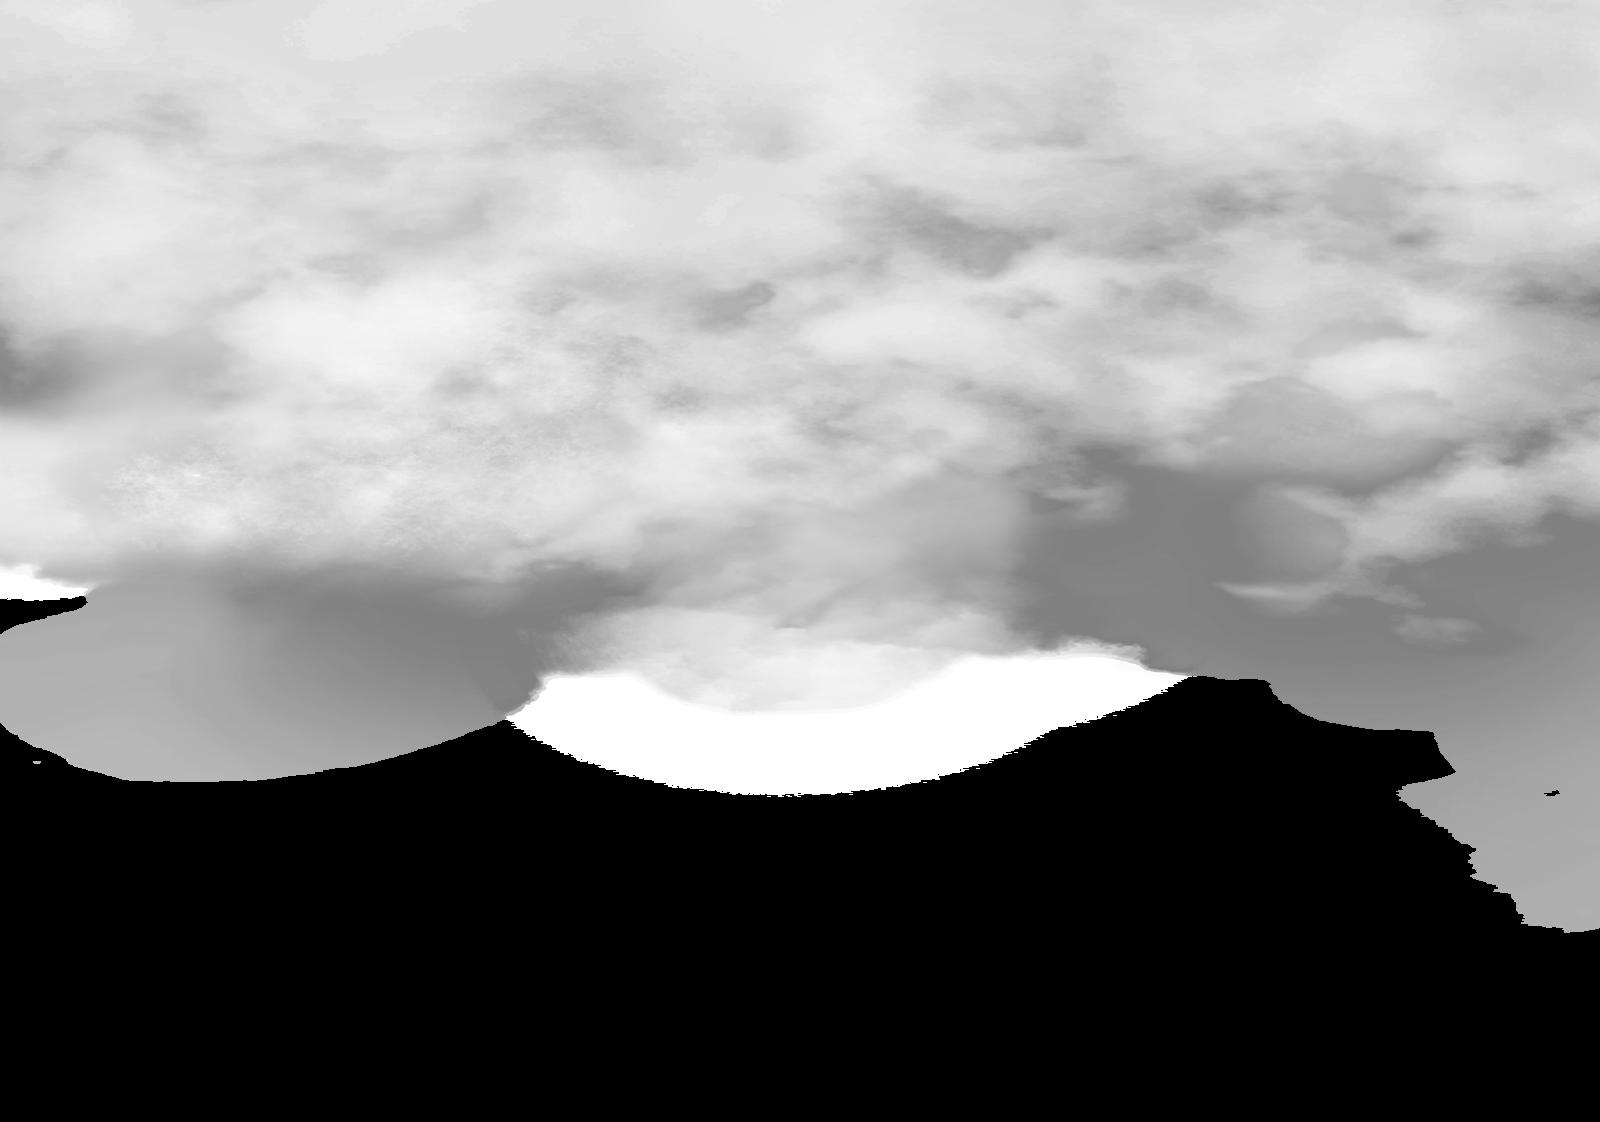 Mist Transparent Background SVG Clip arts